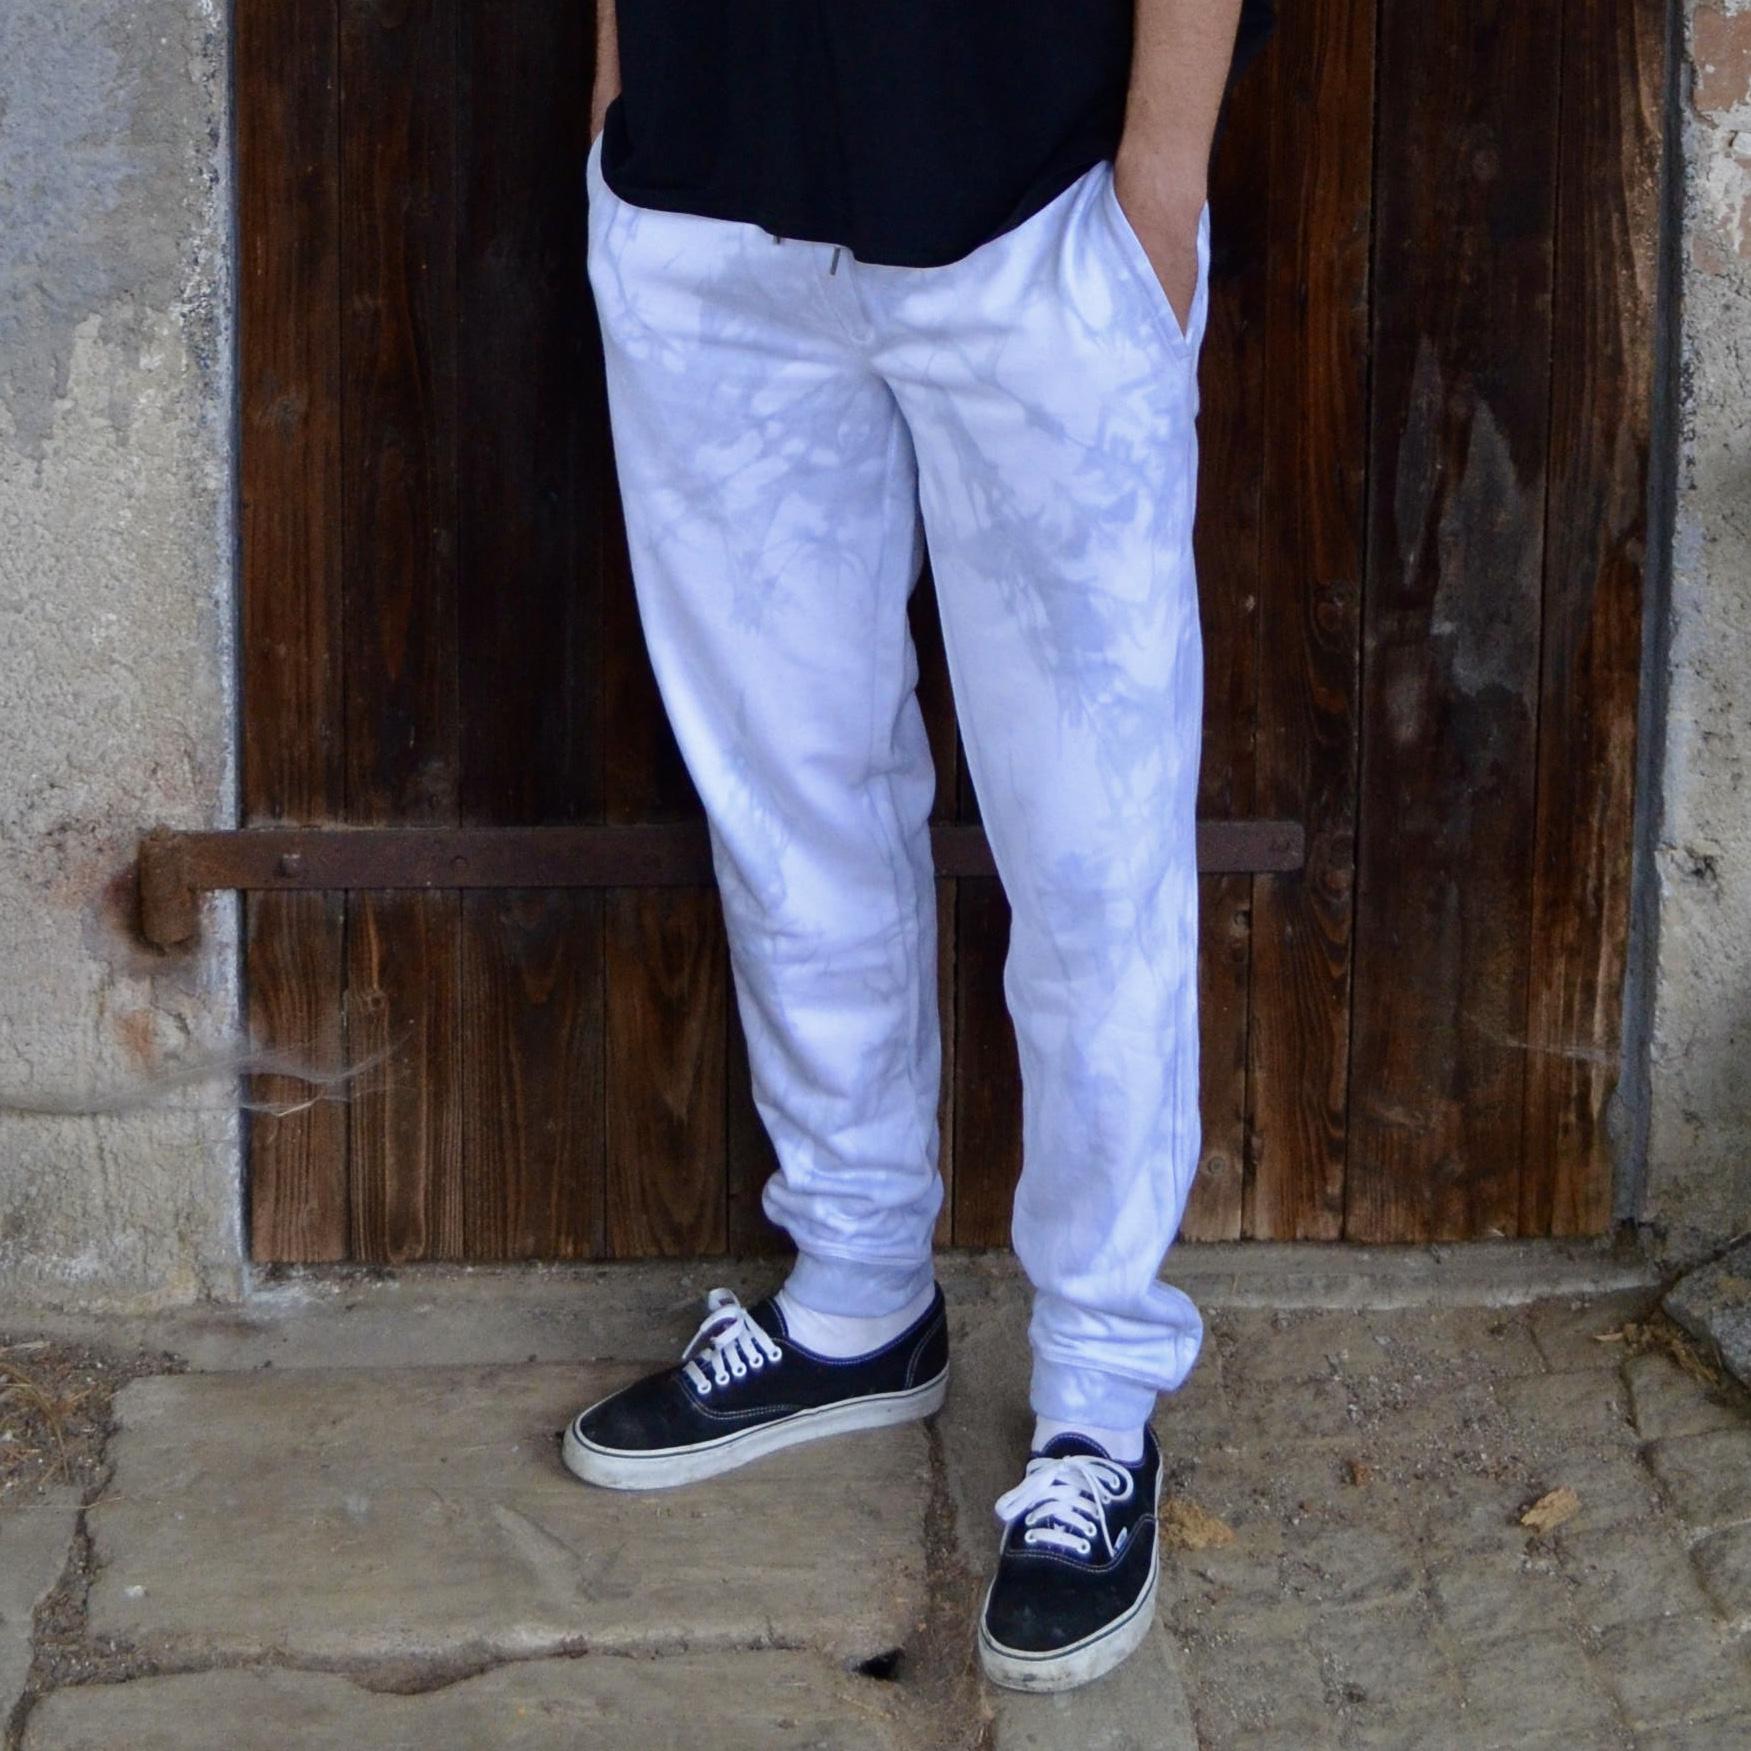 Batik / Tie-Dye Pants Light Grey – Handmade, Organic